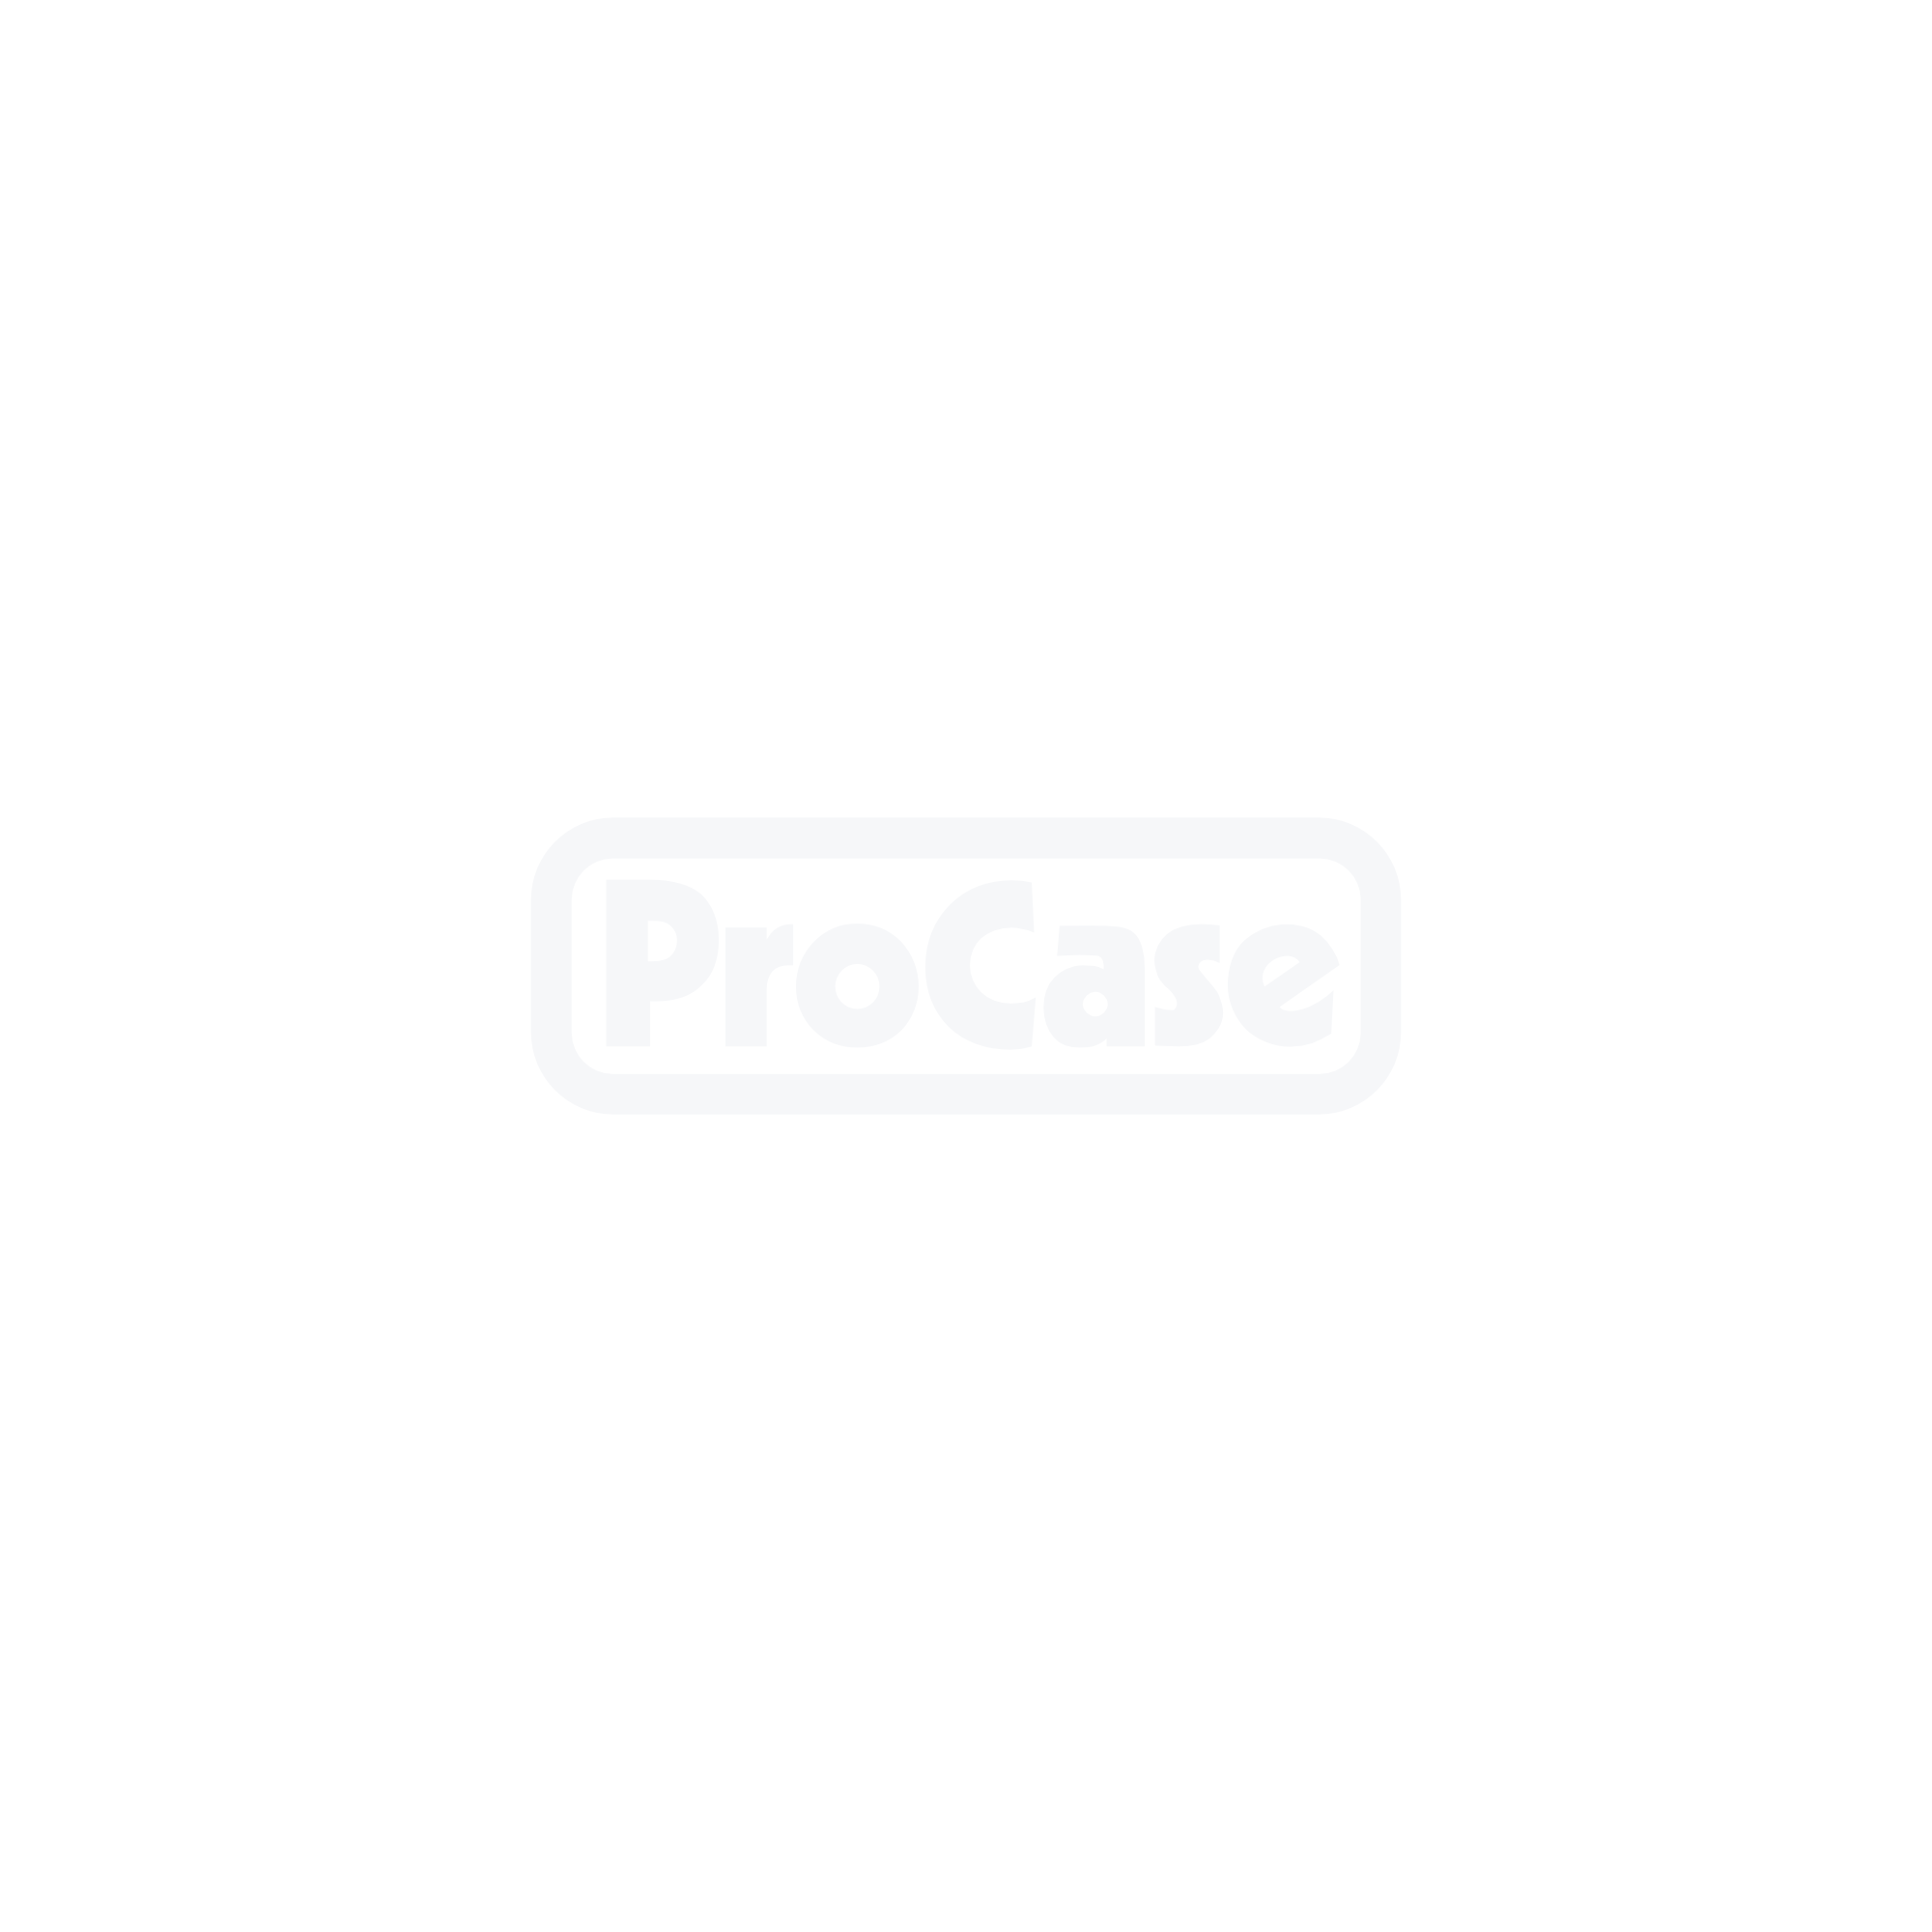 Koffer für 5 Intel Convertible Classmate-PC 2